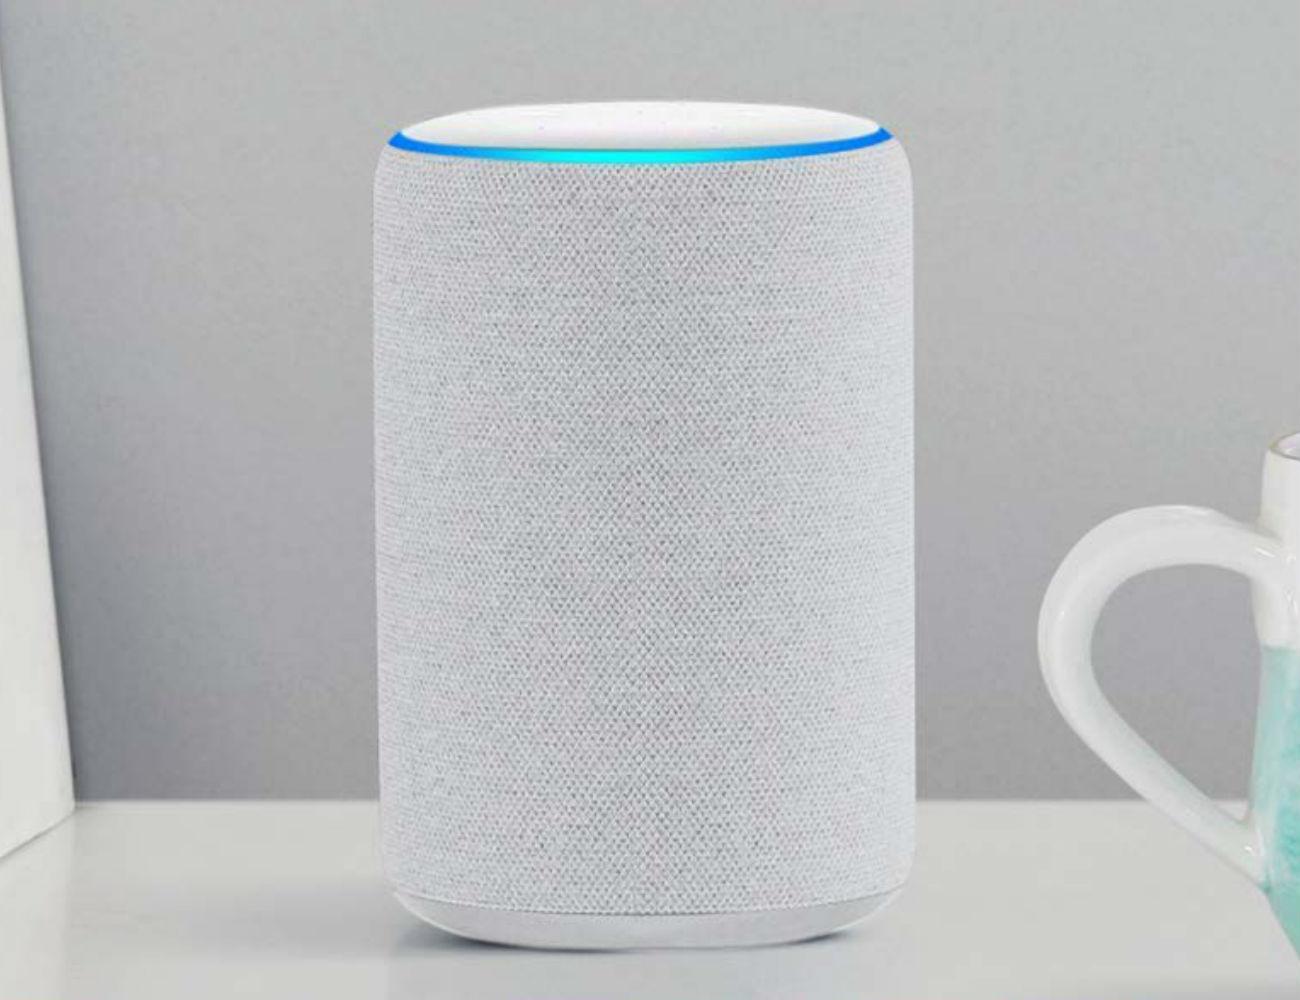 Amazon Echo Plus 2nd Generation Smart Home Hub